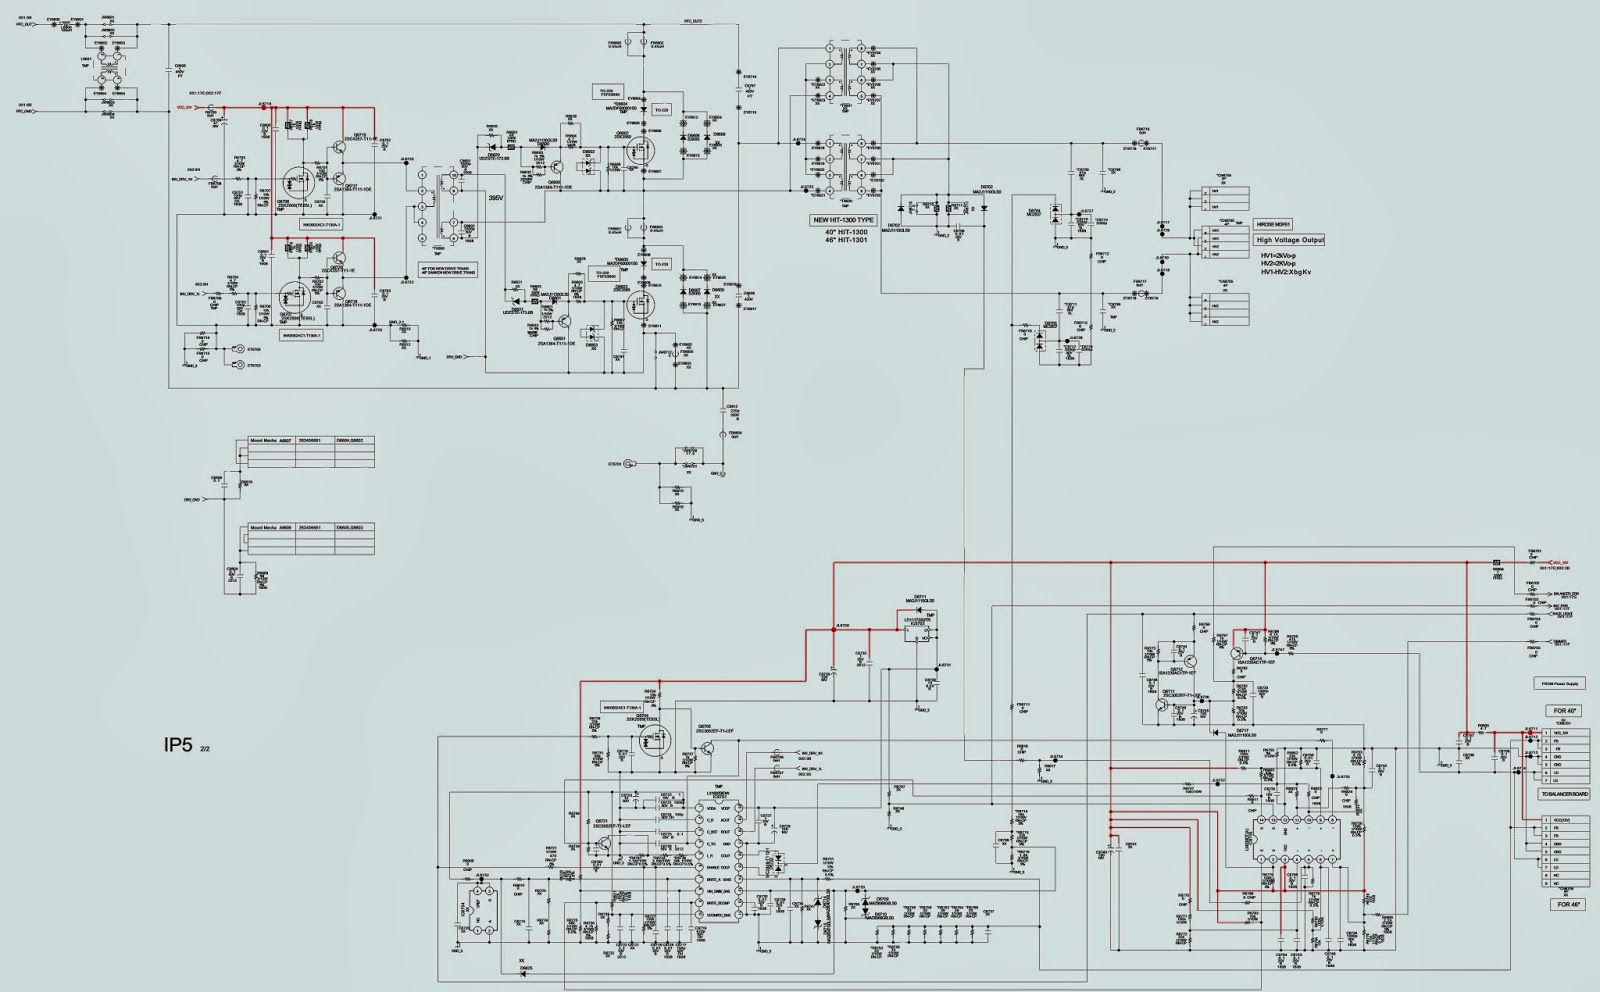 SONY KDL 40U4000  FLAT PANEL TV  POWER SUPPLY [SMPS